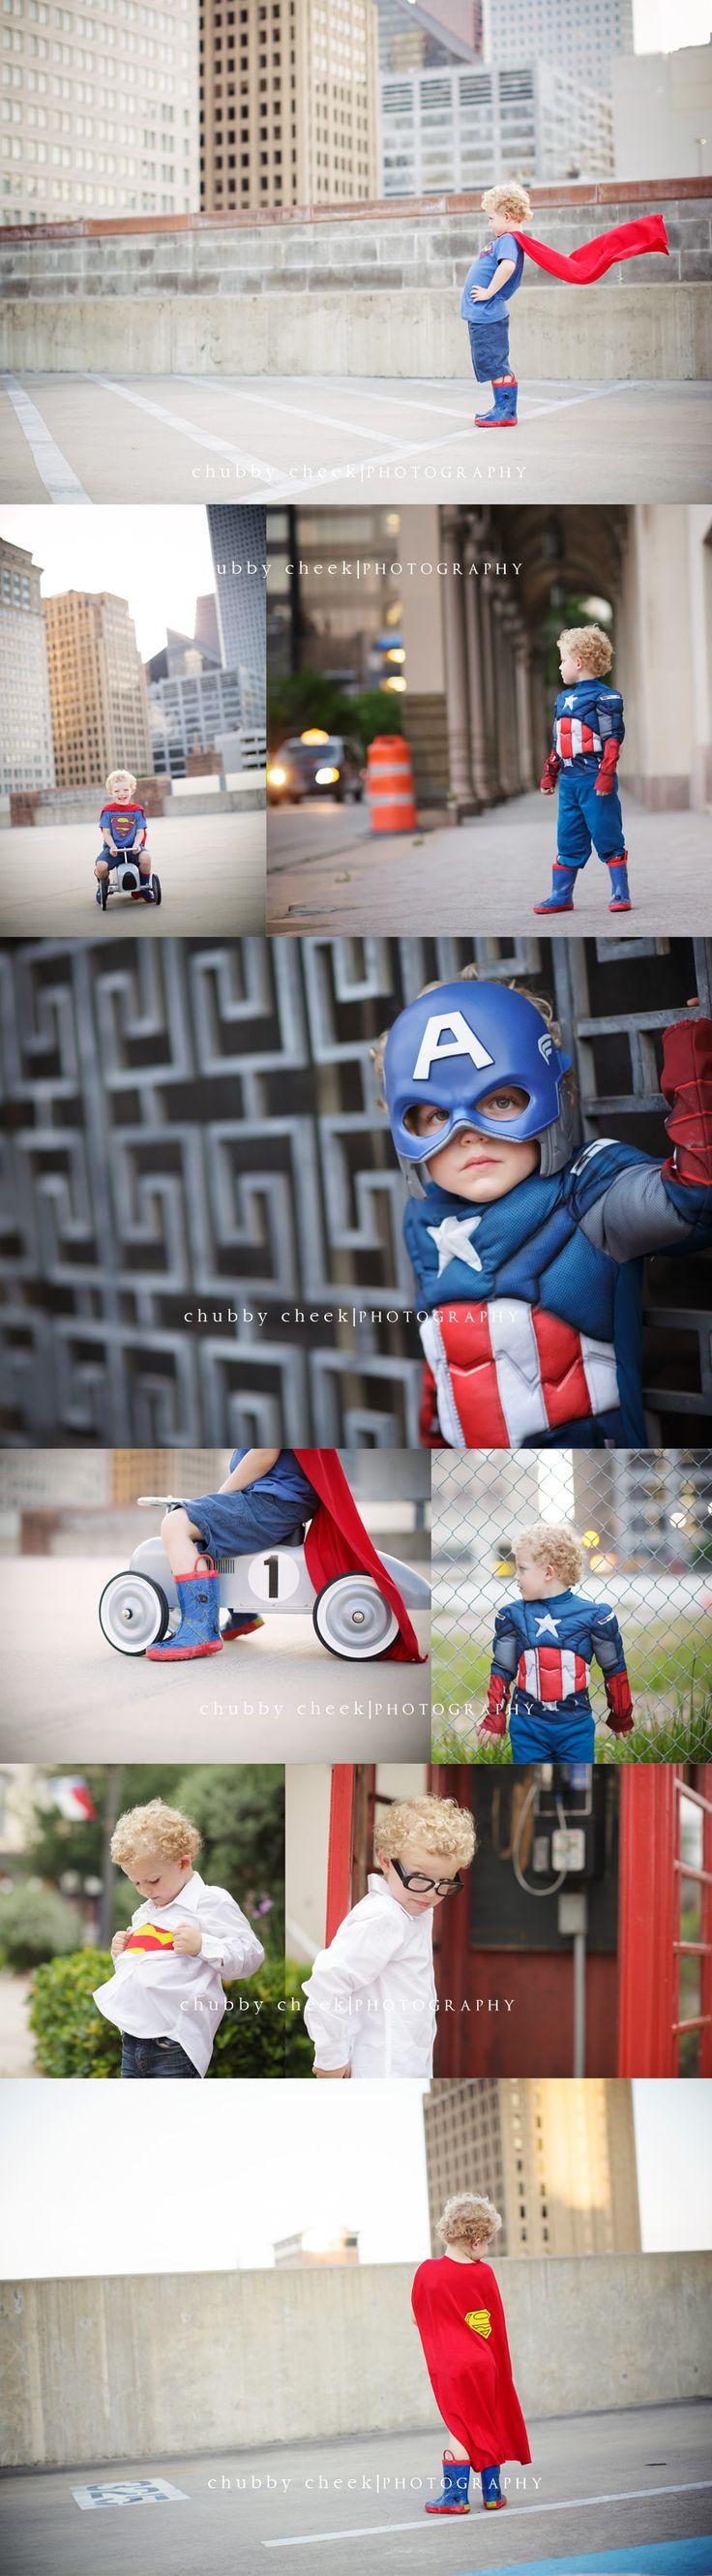 Superhero Photo Shoot part2!! Chubby Cheek Photography Houston, TX Natural Light Photographer